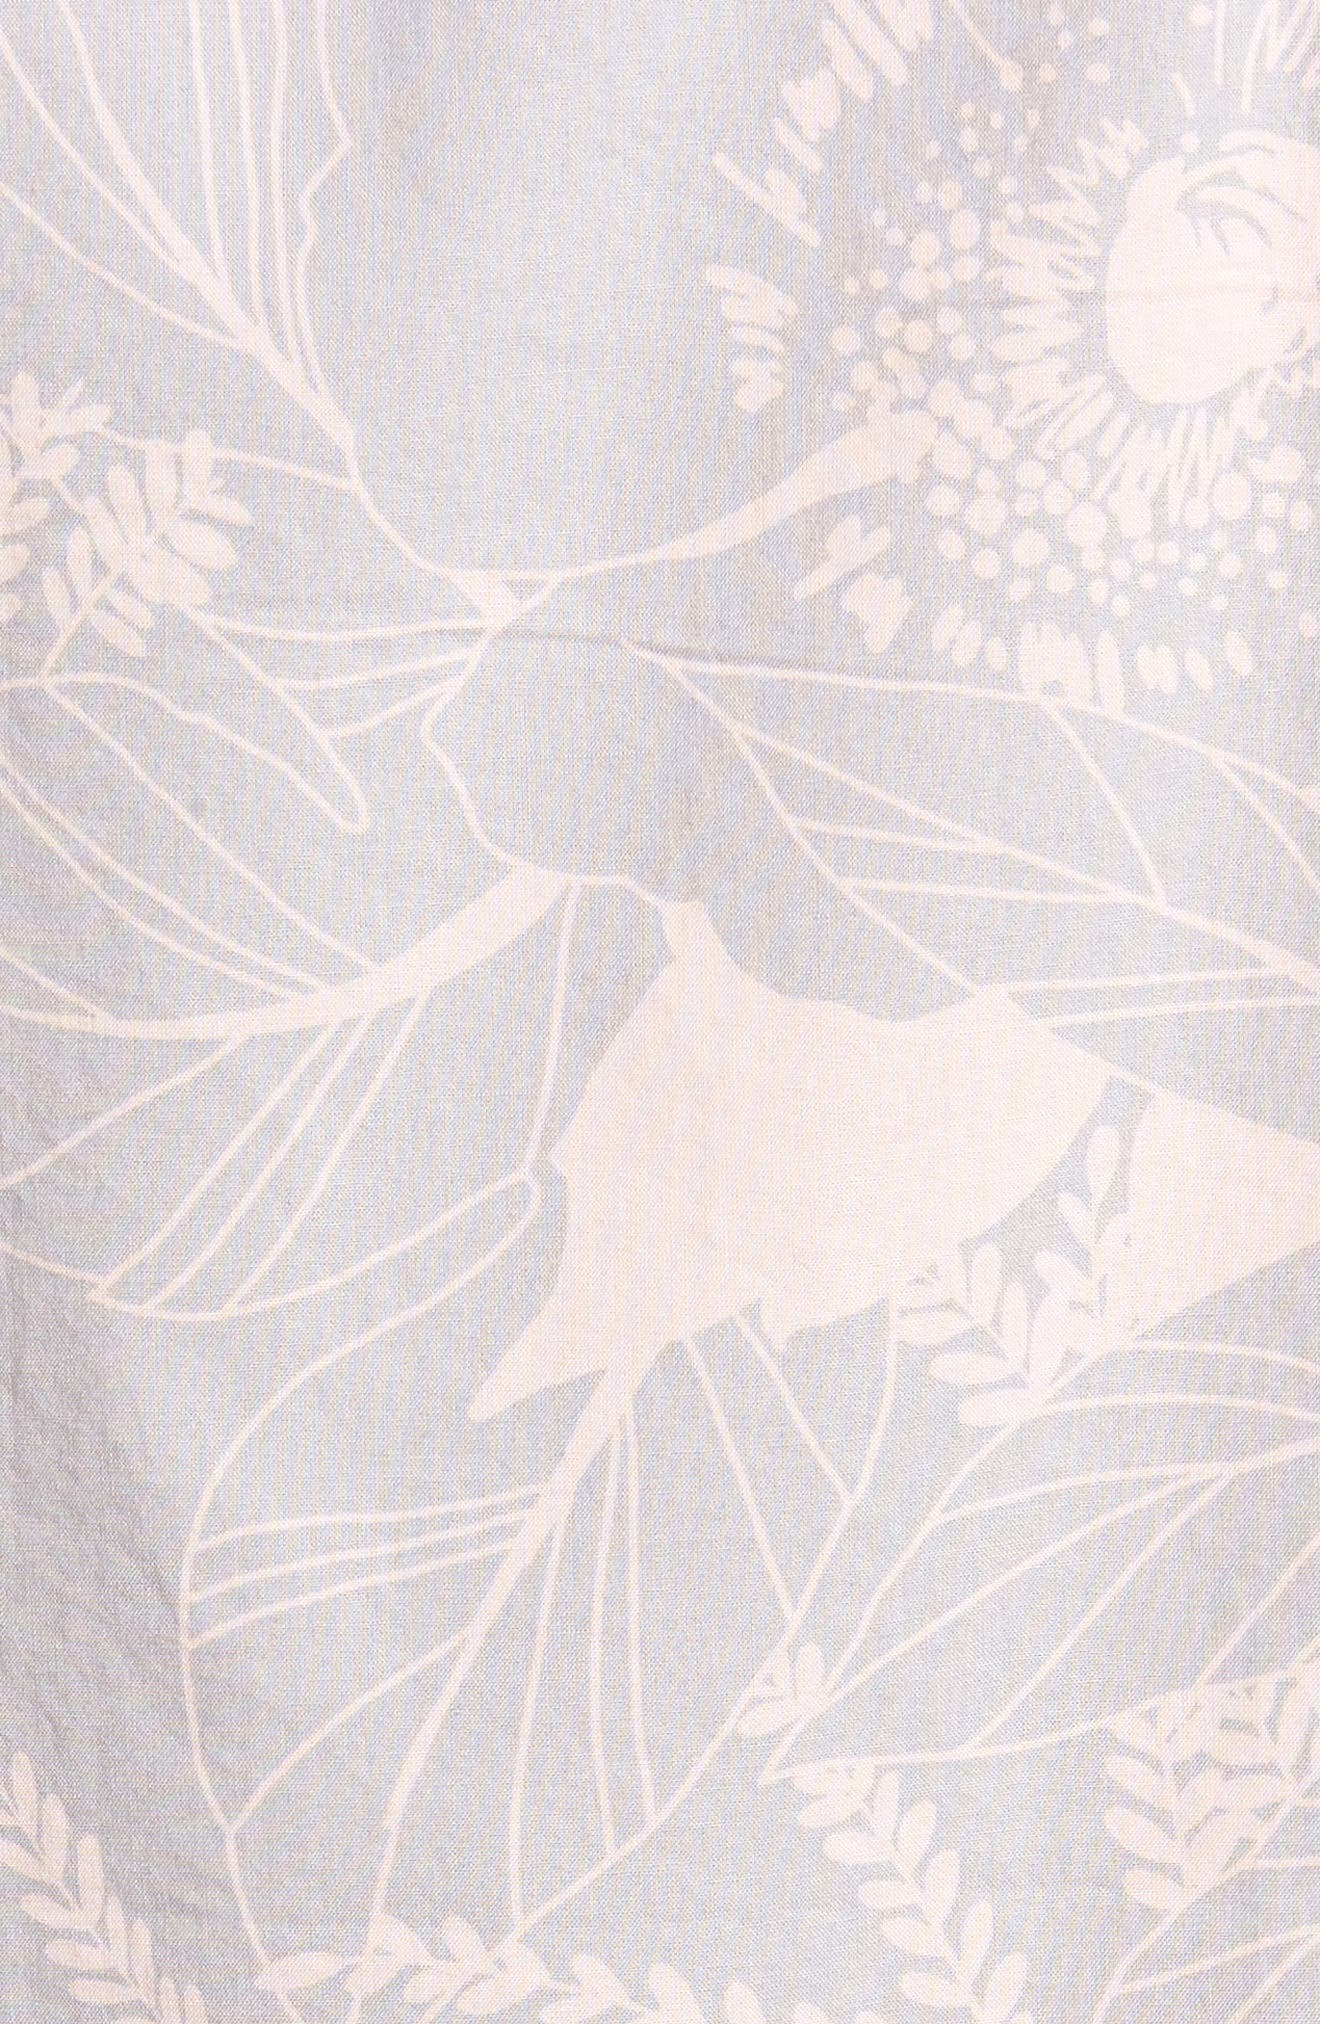 Riviera Slim Fit Floral Print Sport Shirt,                             Alternate thumbnail 5, color,                             LINEAR FLORAL - SKIVVY PINK